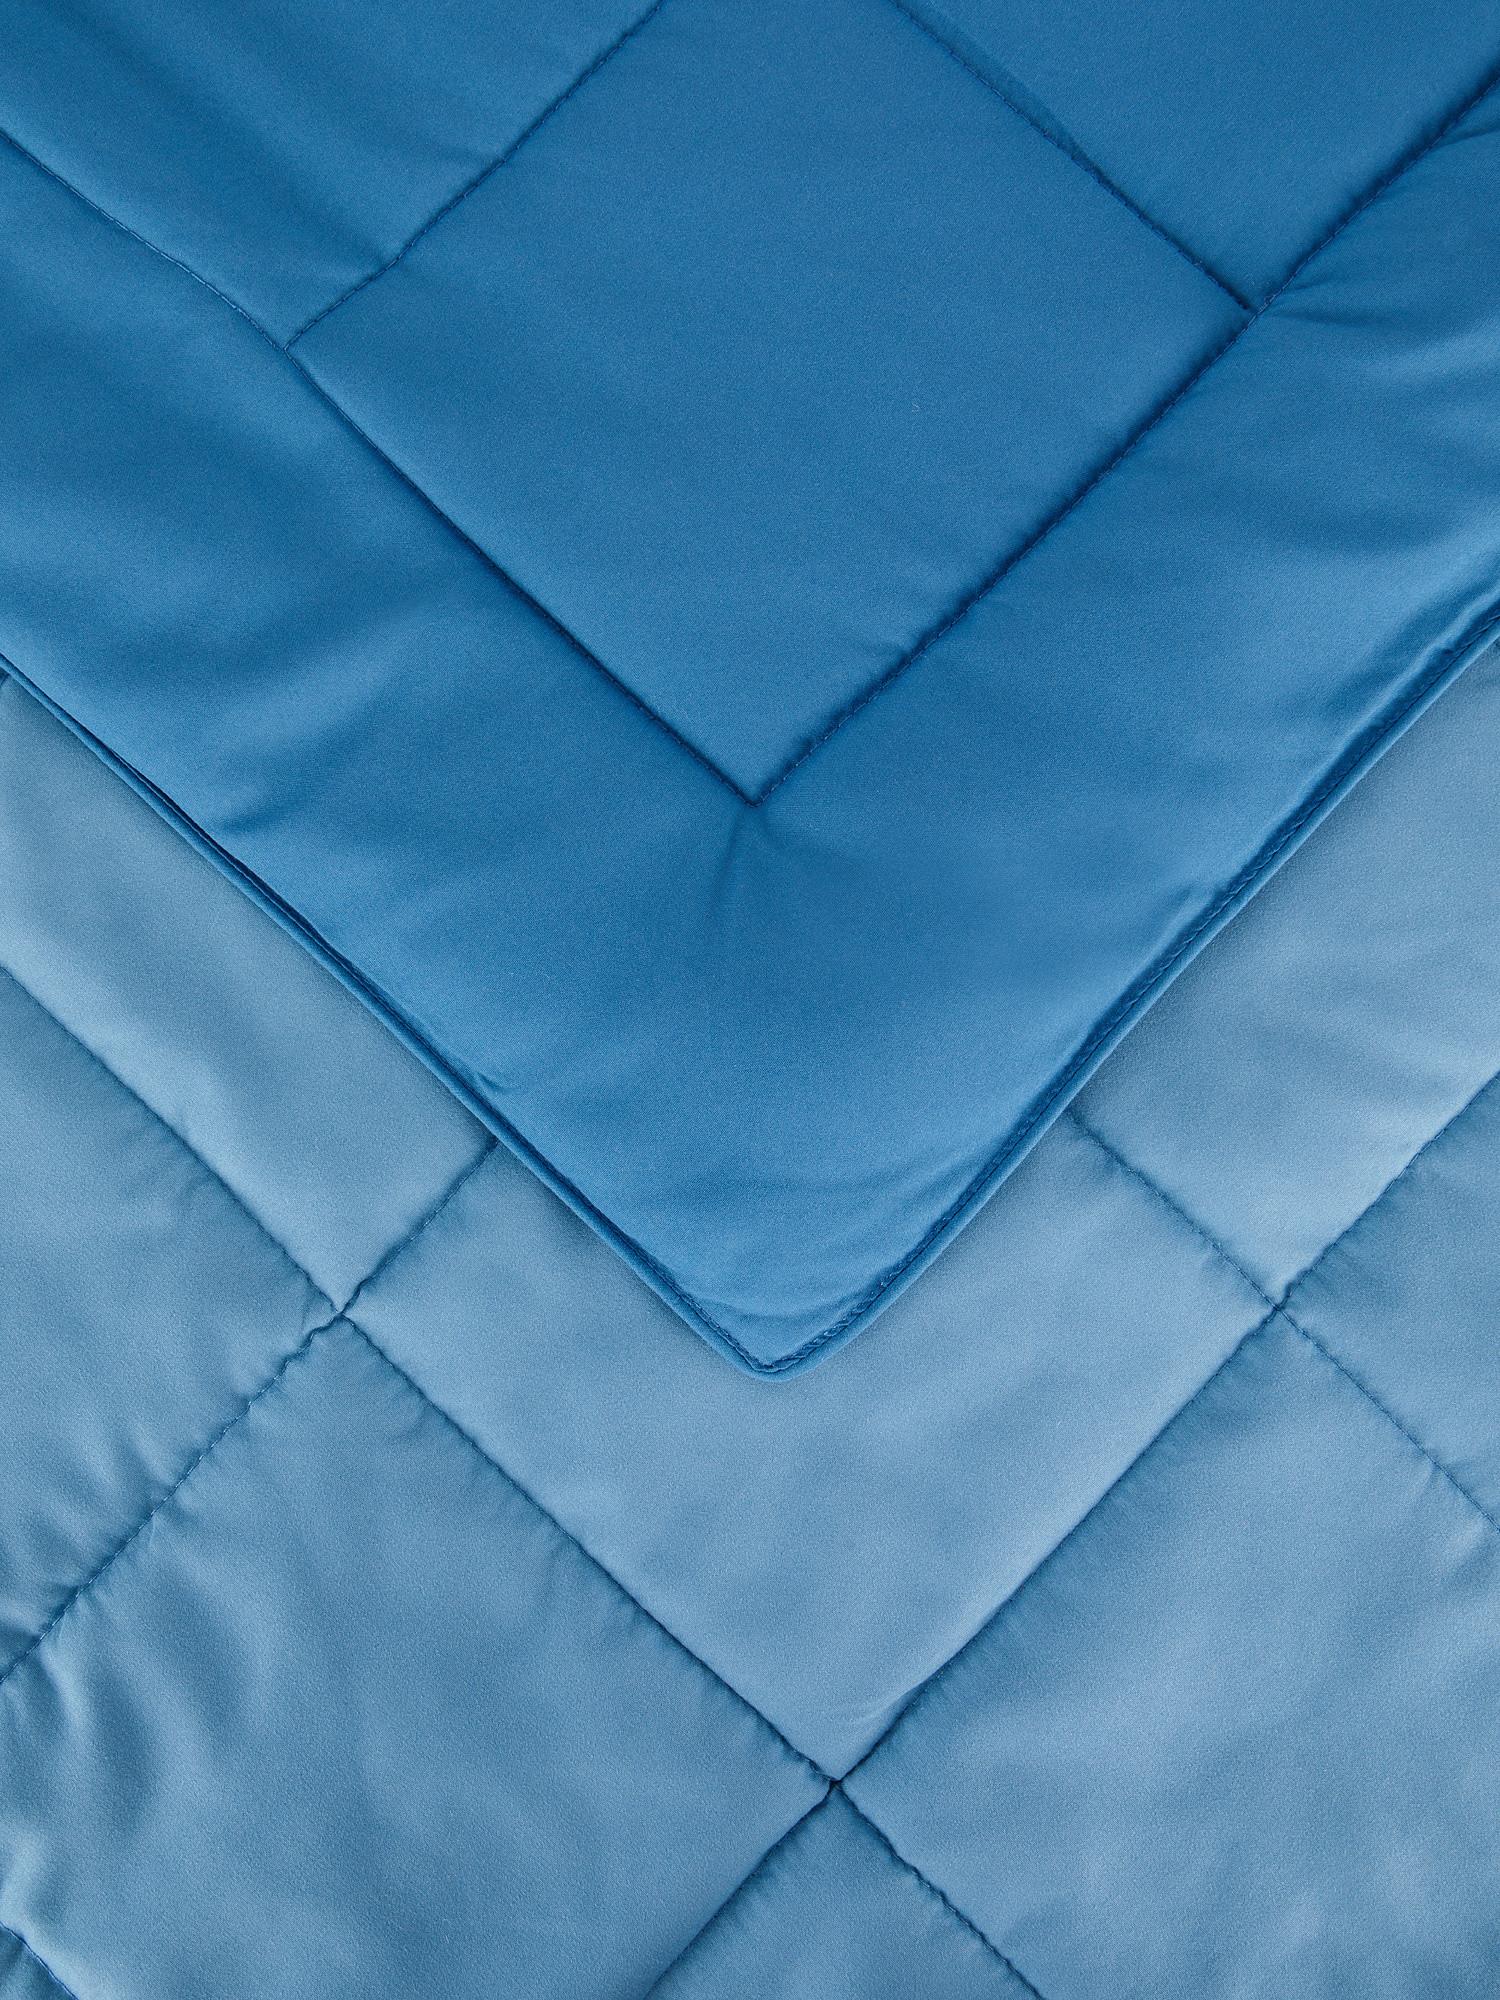 Trapunta microfibra aloe vera, Blu, large image number 2